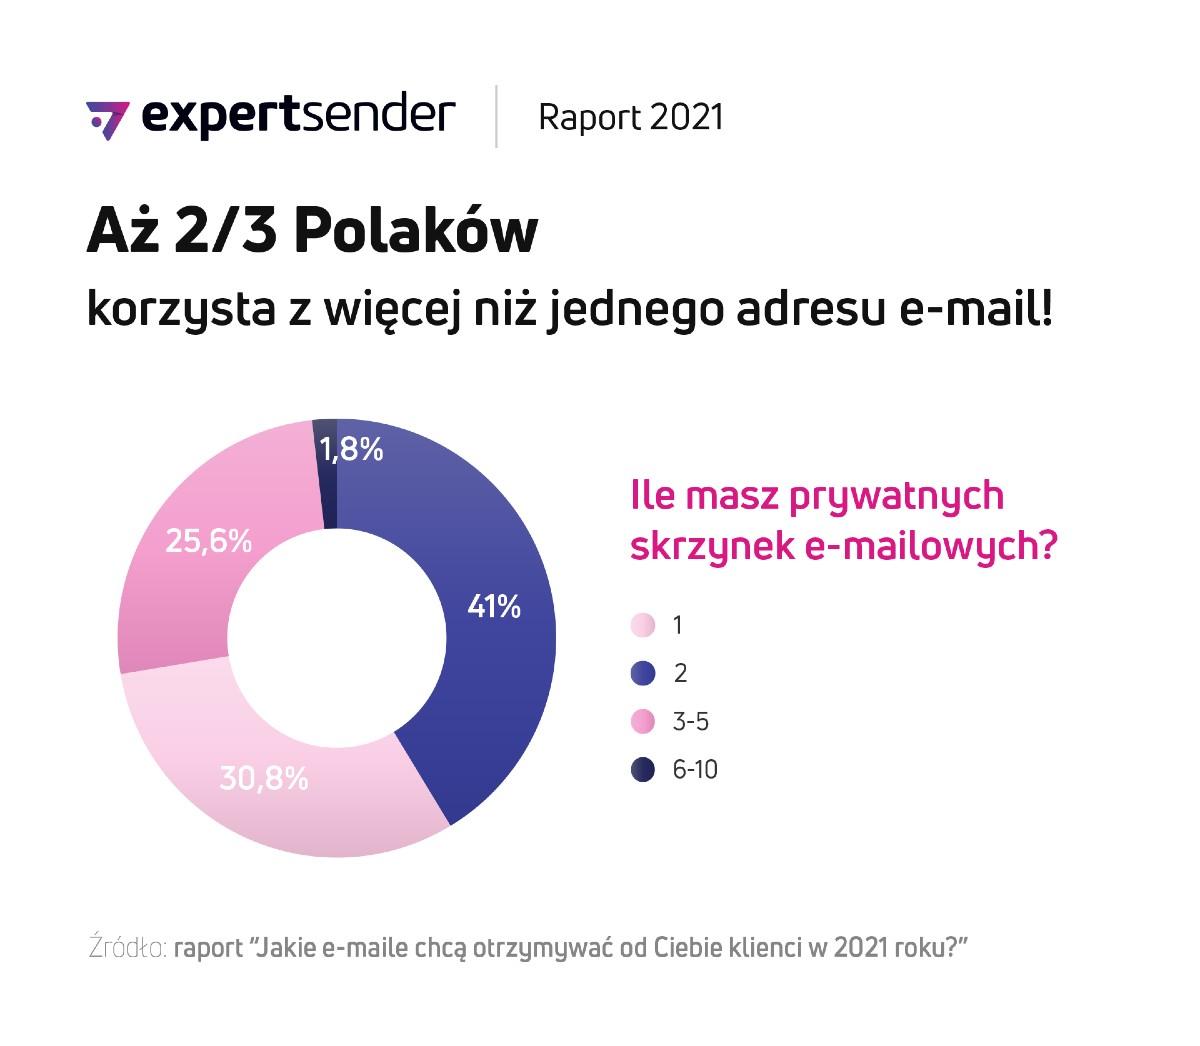 raport_e-mail_Skrzynki_mailowe_ExpertSender